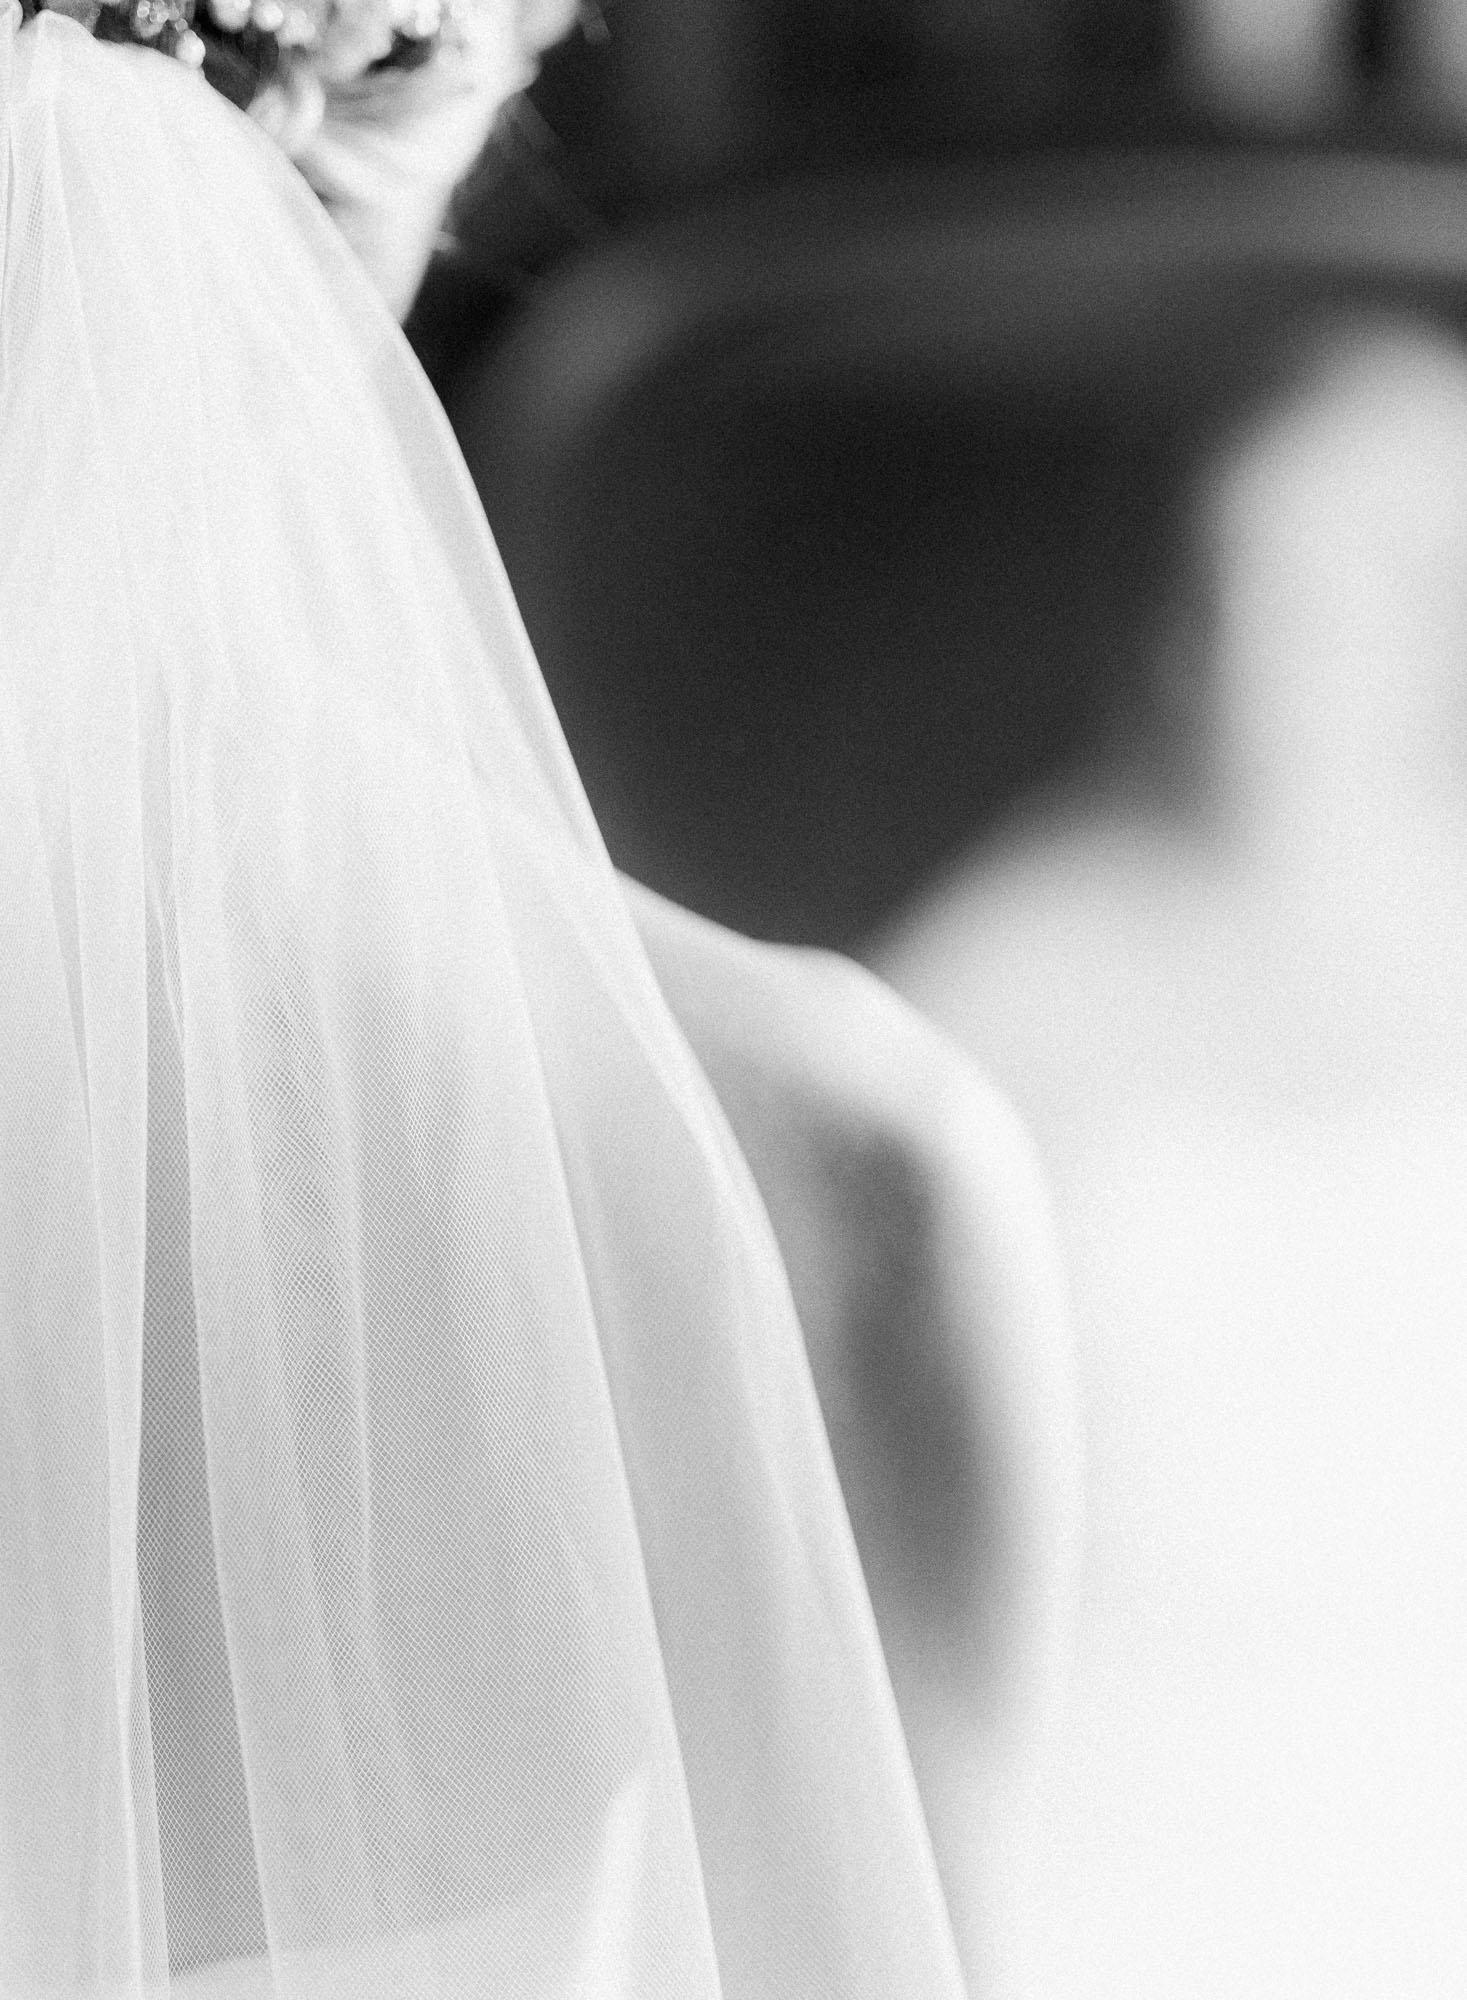 scottish_wedding_blairquhan_castle-34.jpg